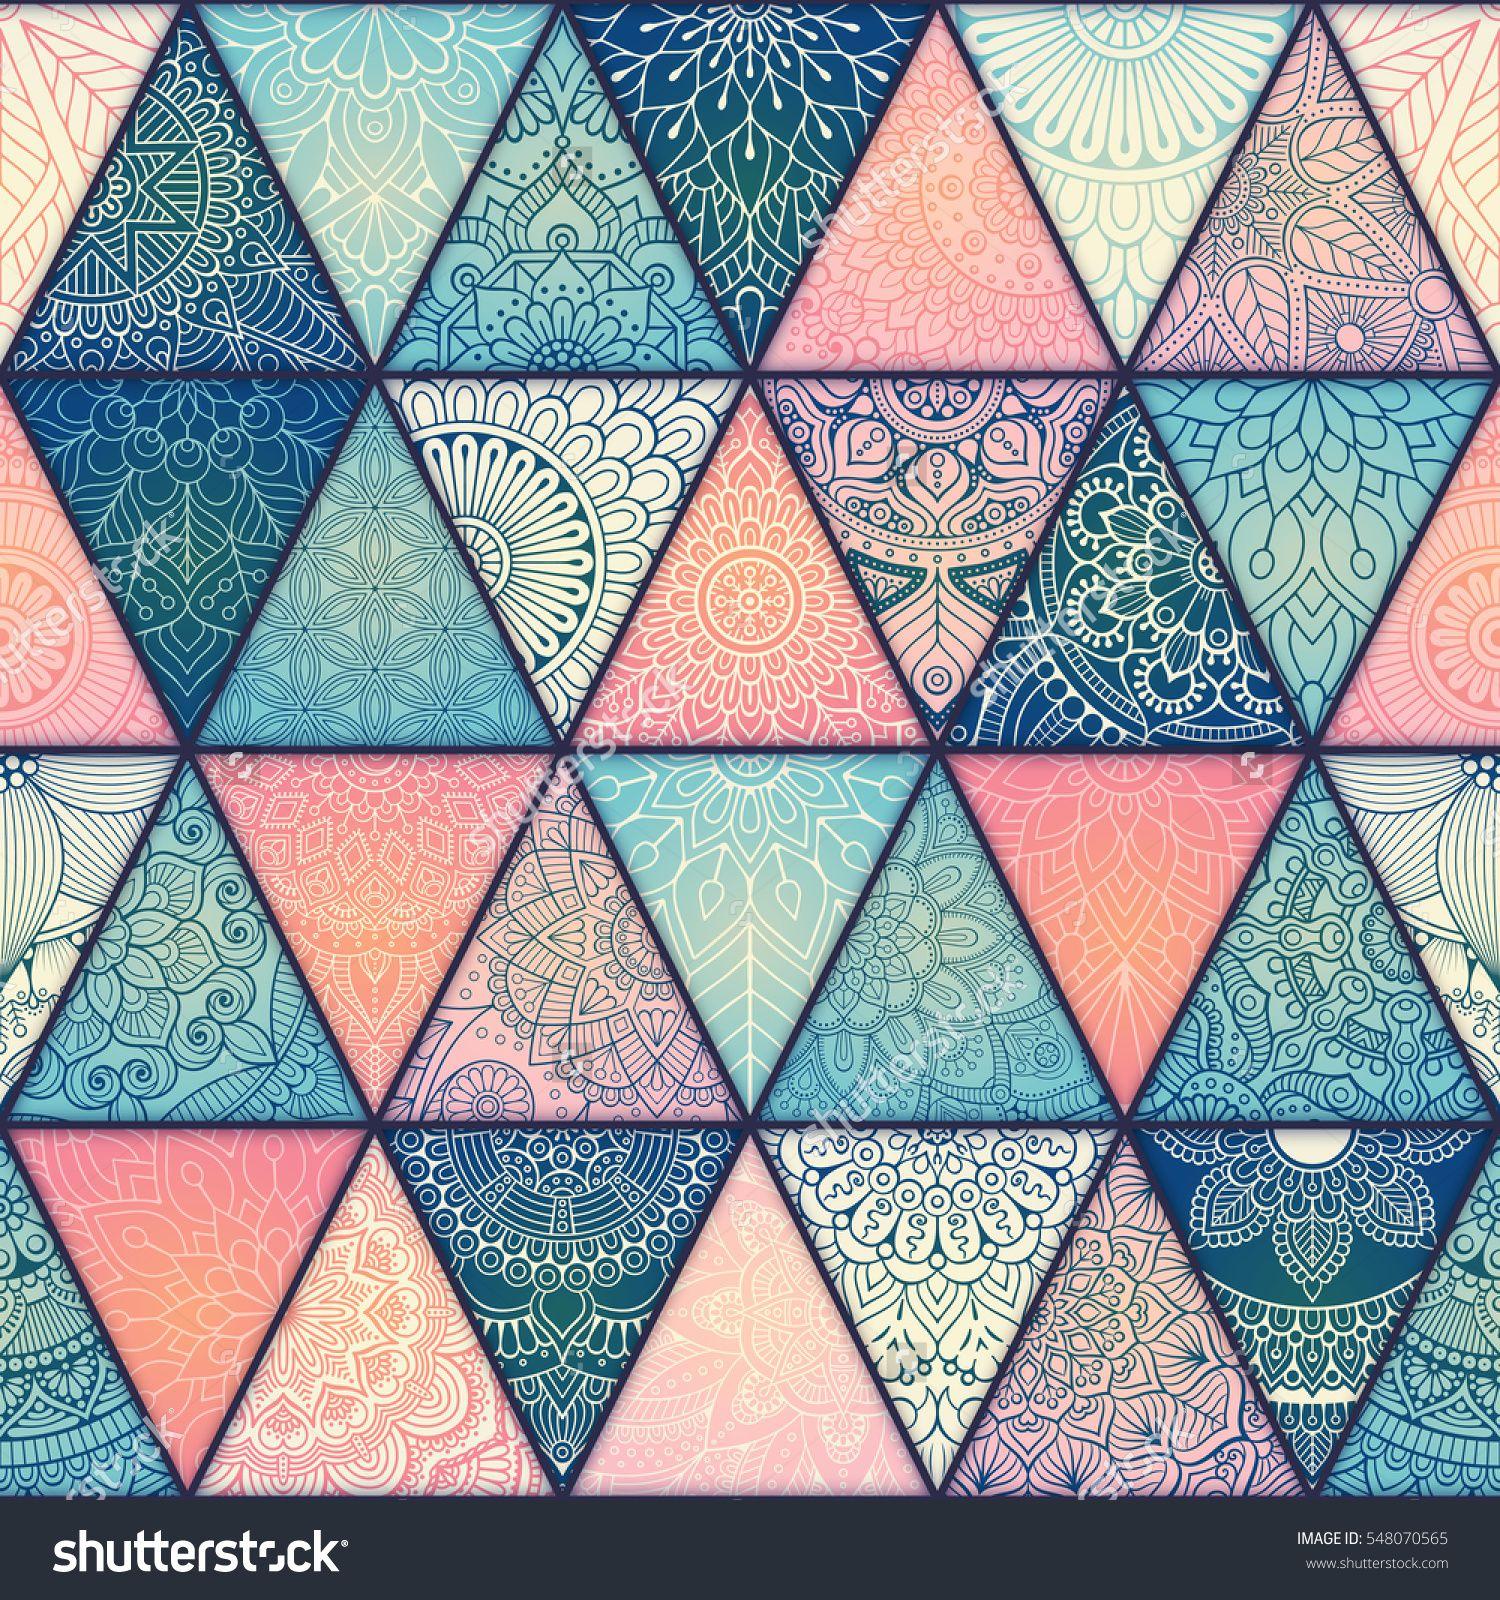 Seamless Mandalas Pattern Vintage Decorative Elements